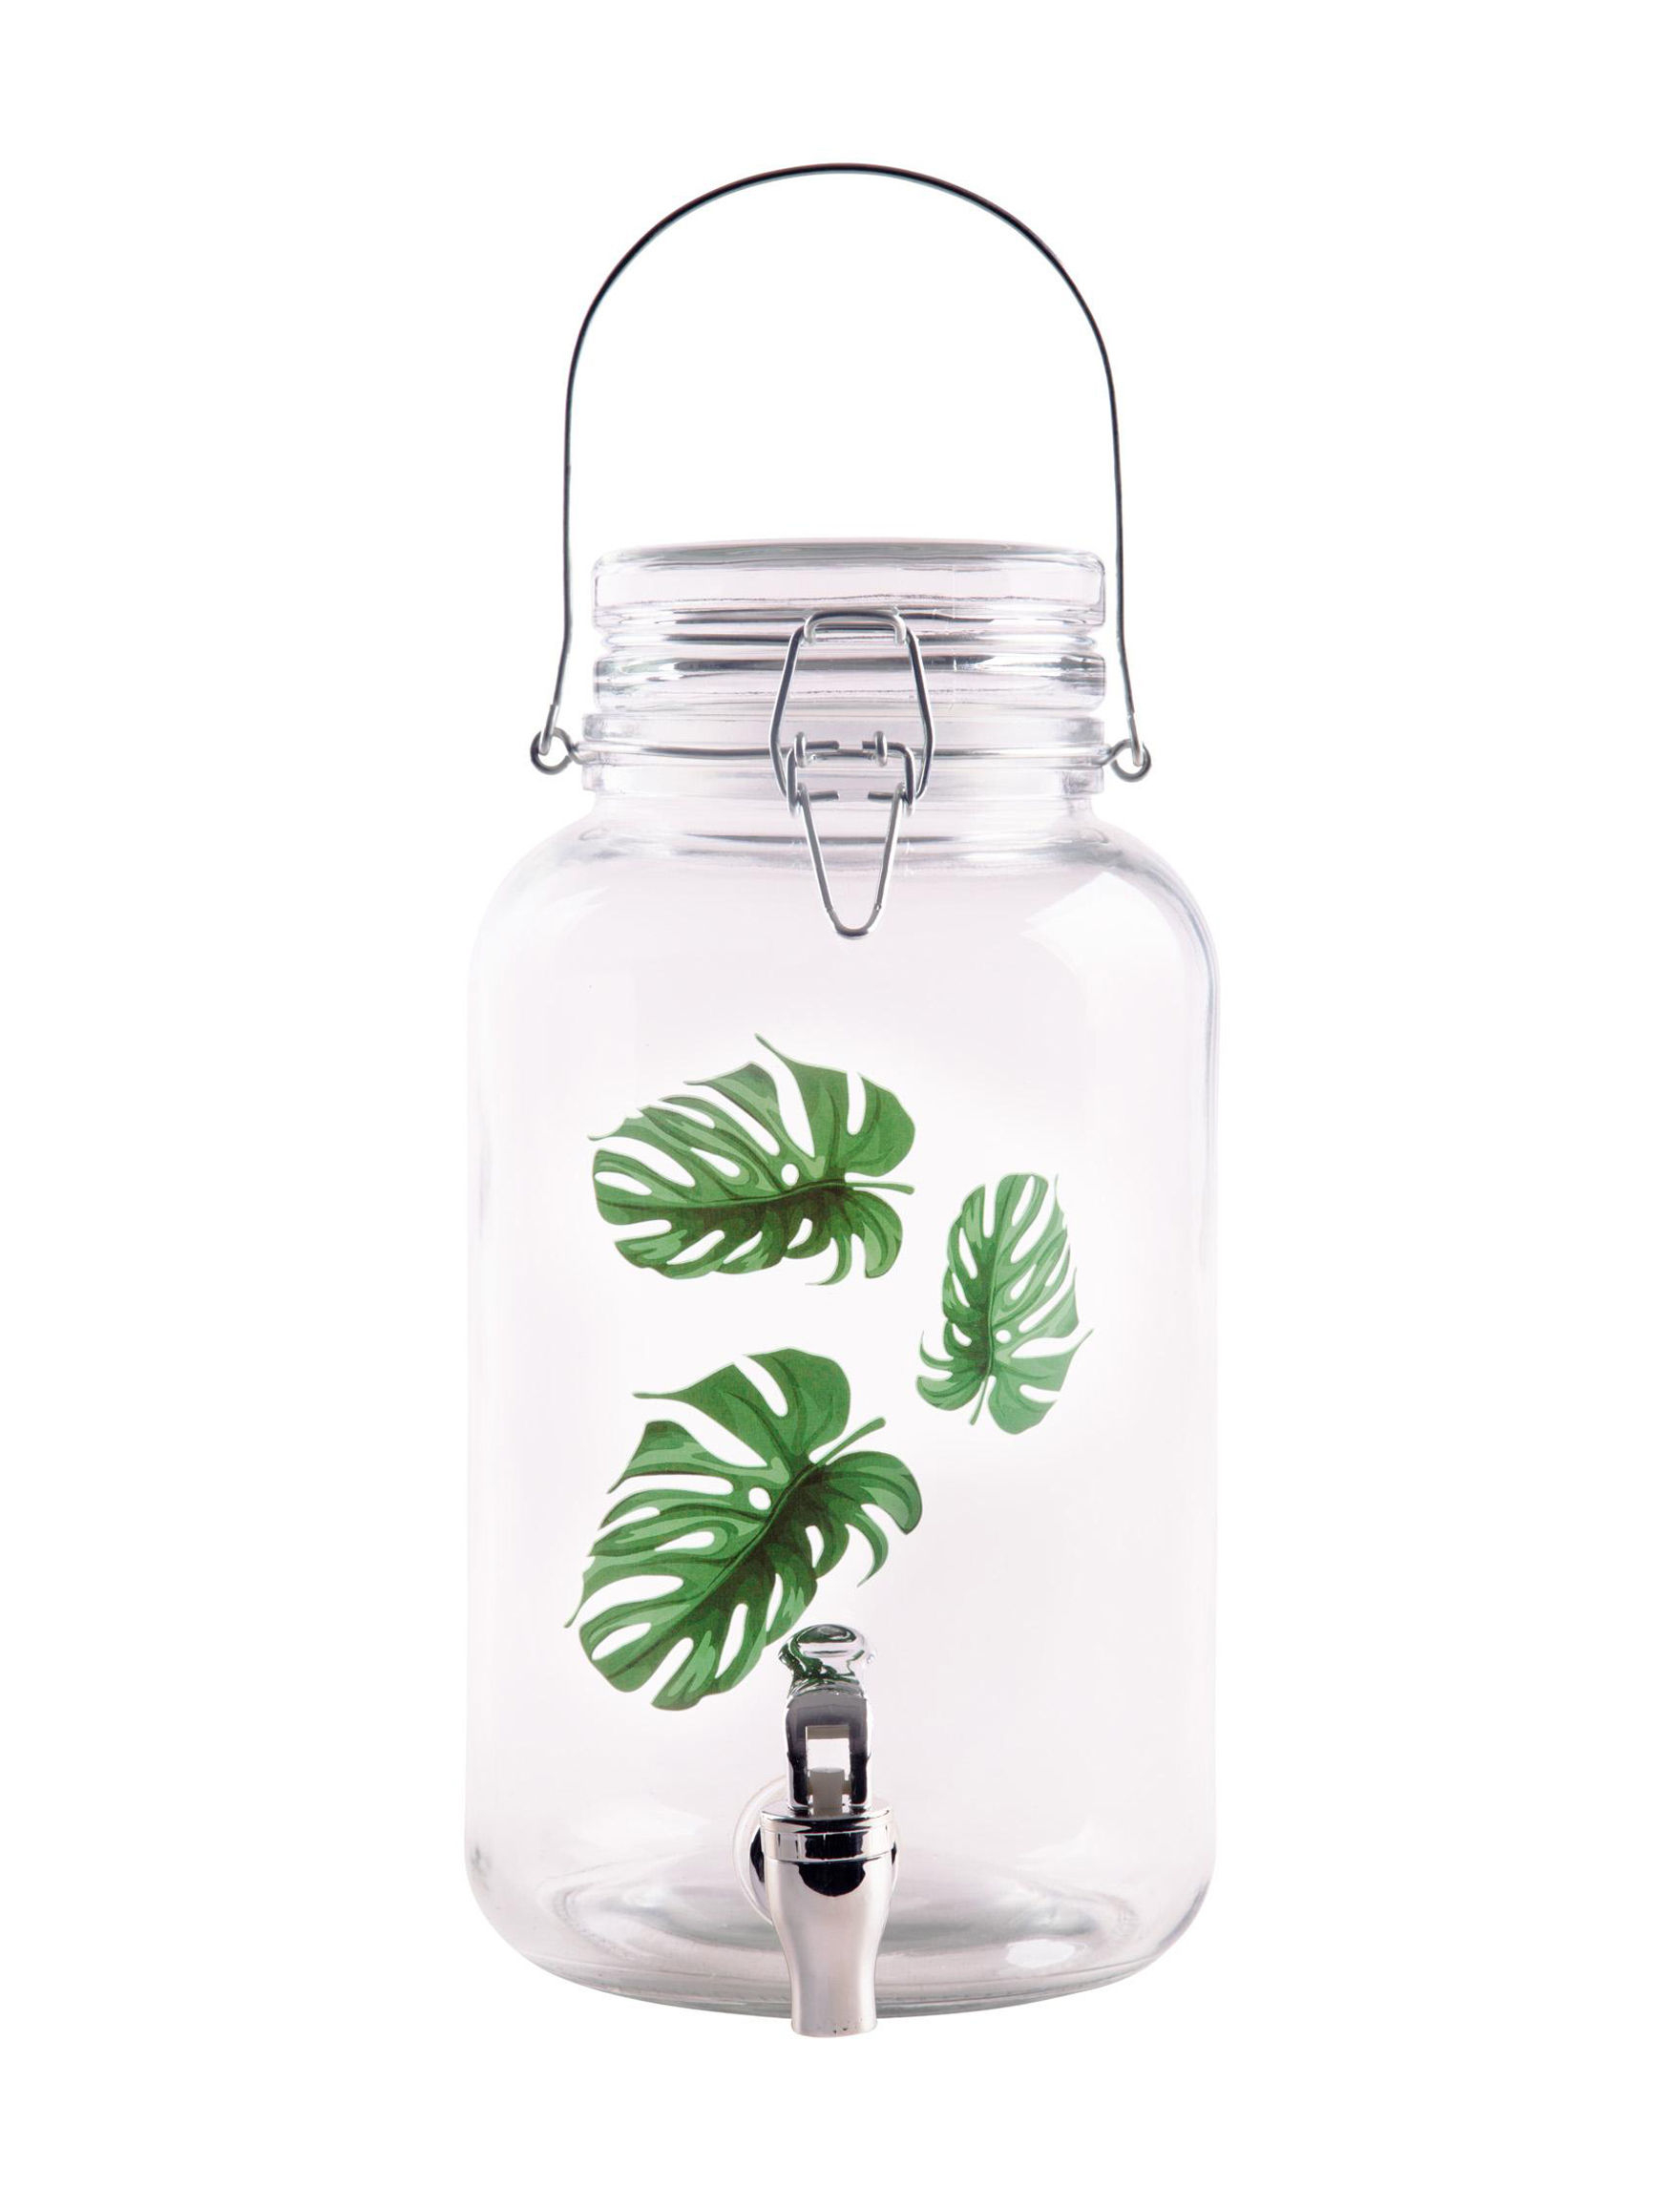 Home Essentials  Beverage Dispensers & Tubs Serveware